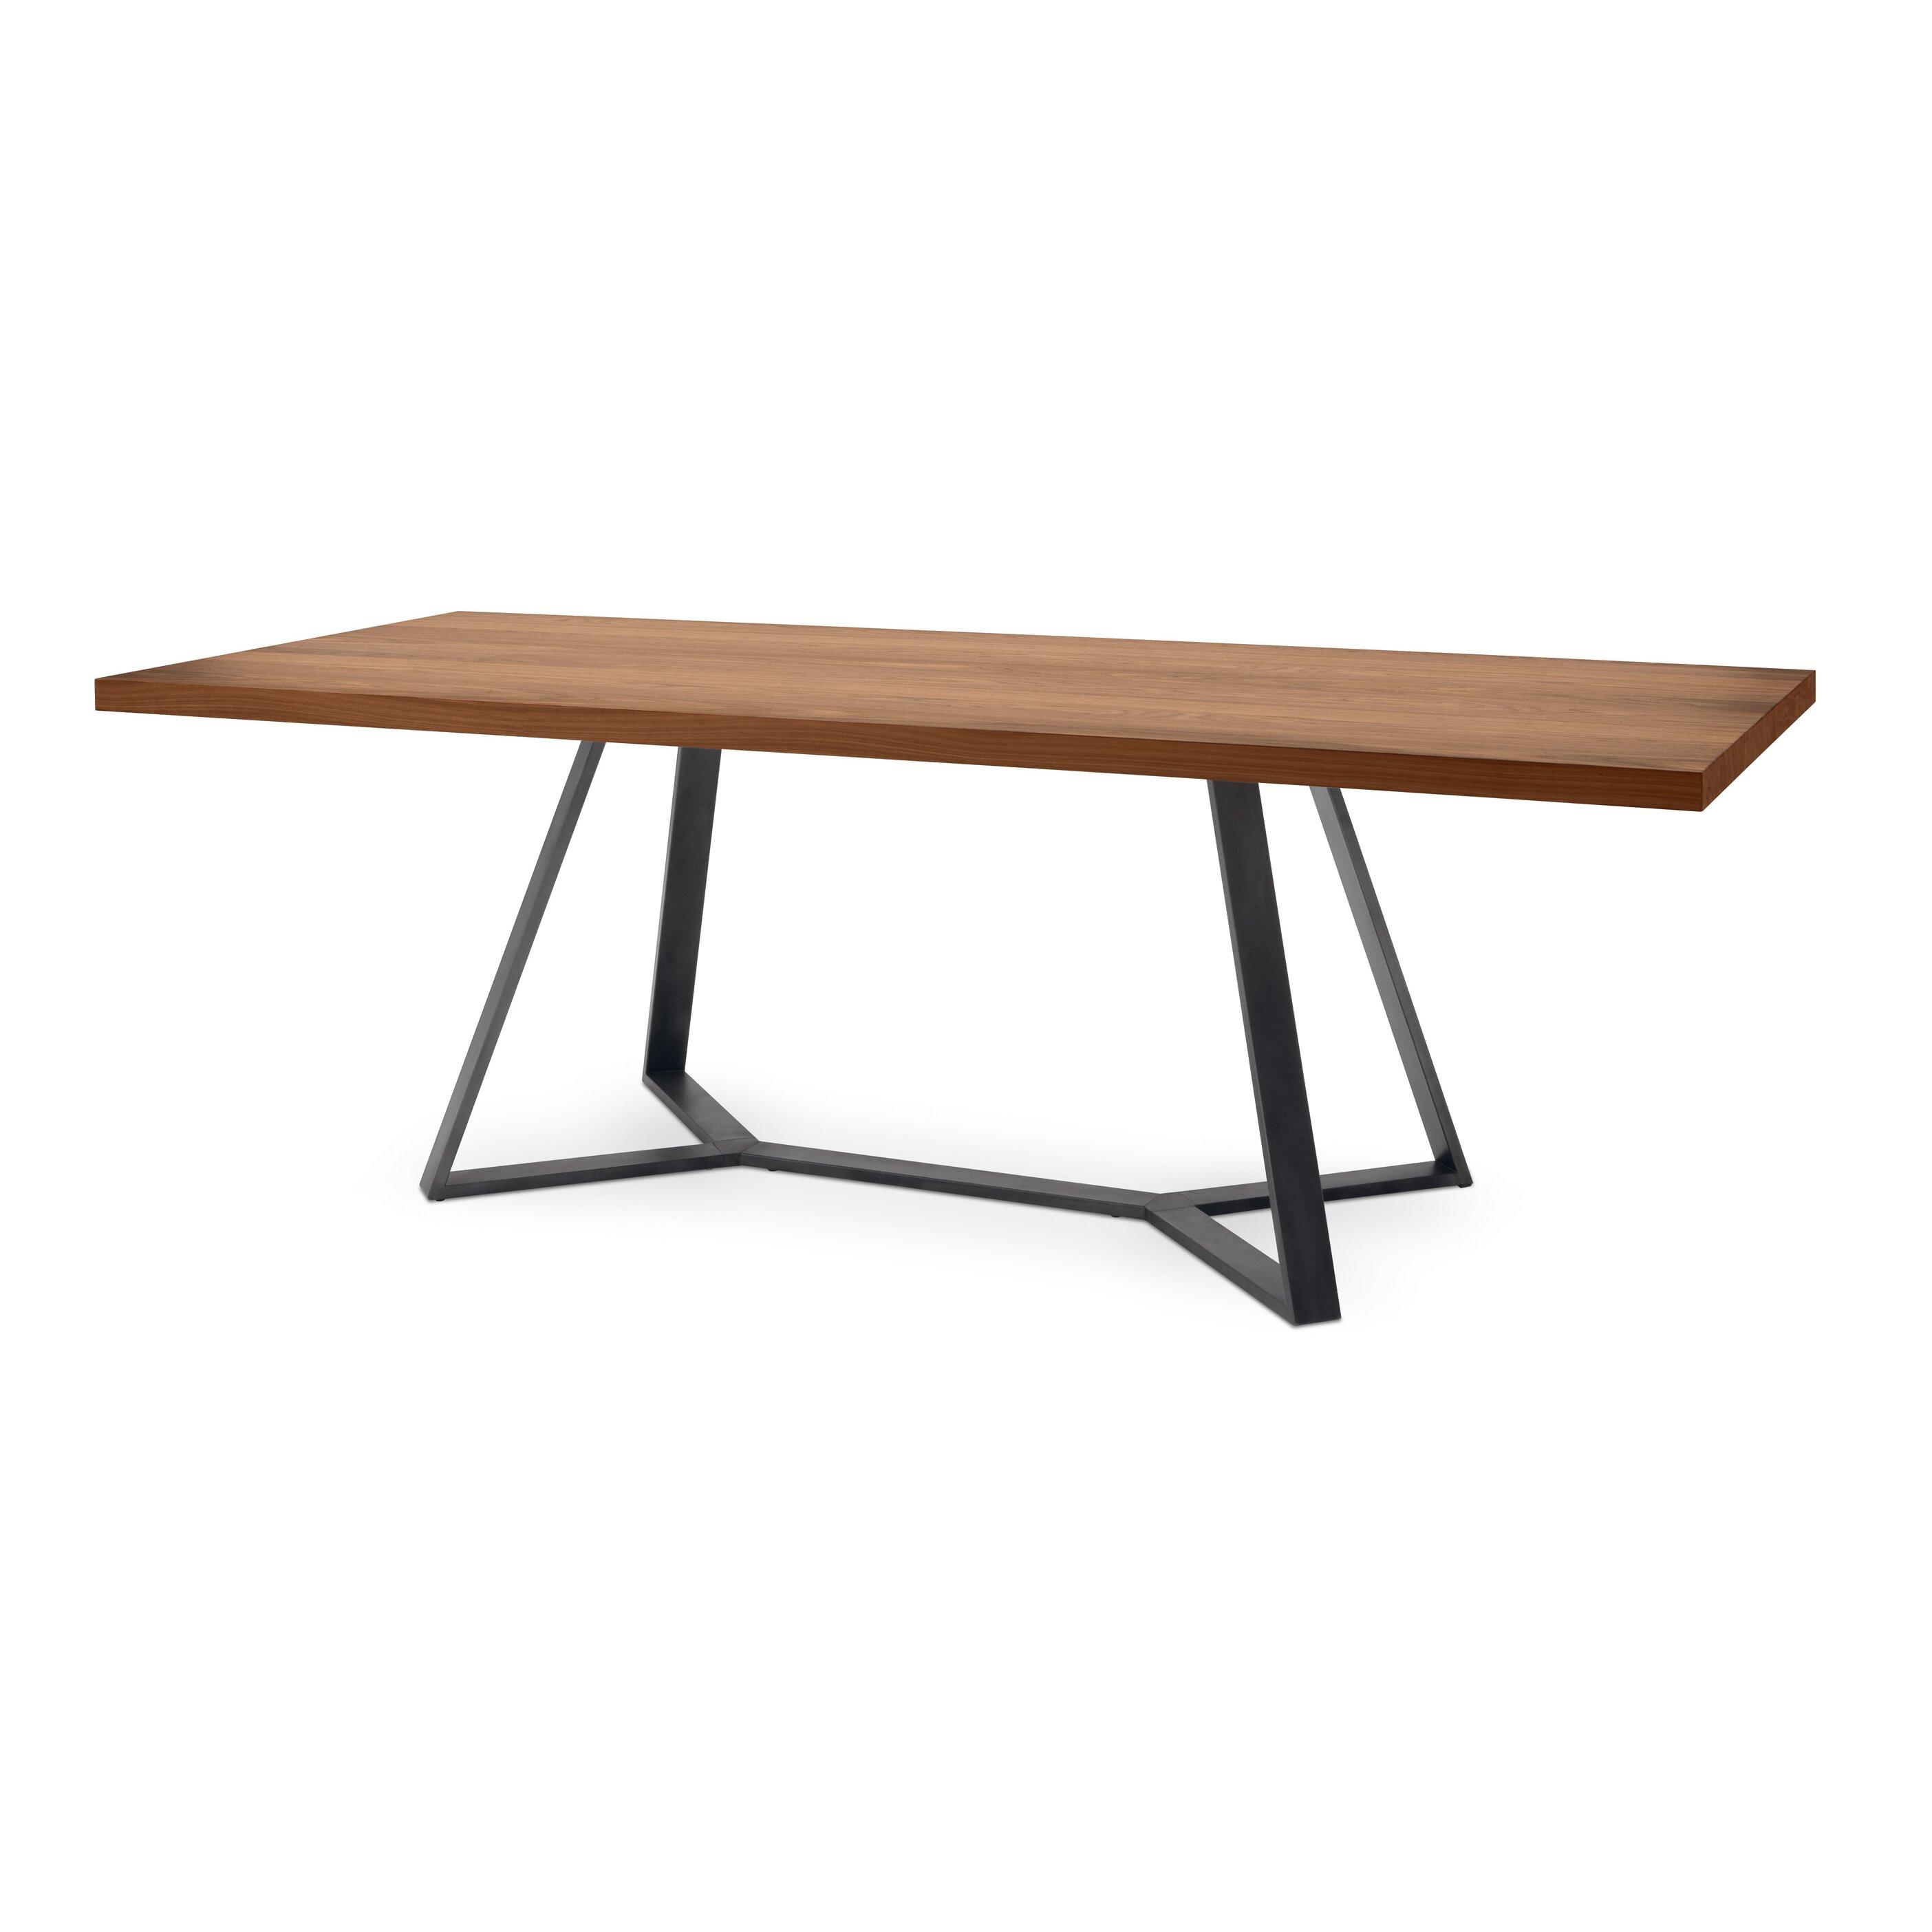 Domitalia archie l 240 dining table reviews wayfair for Wayfair dining tables